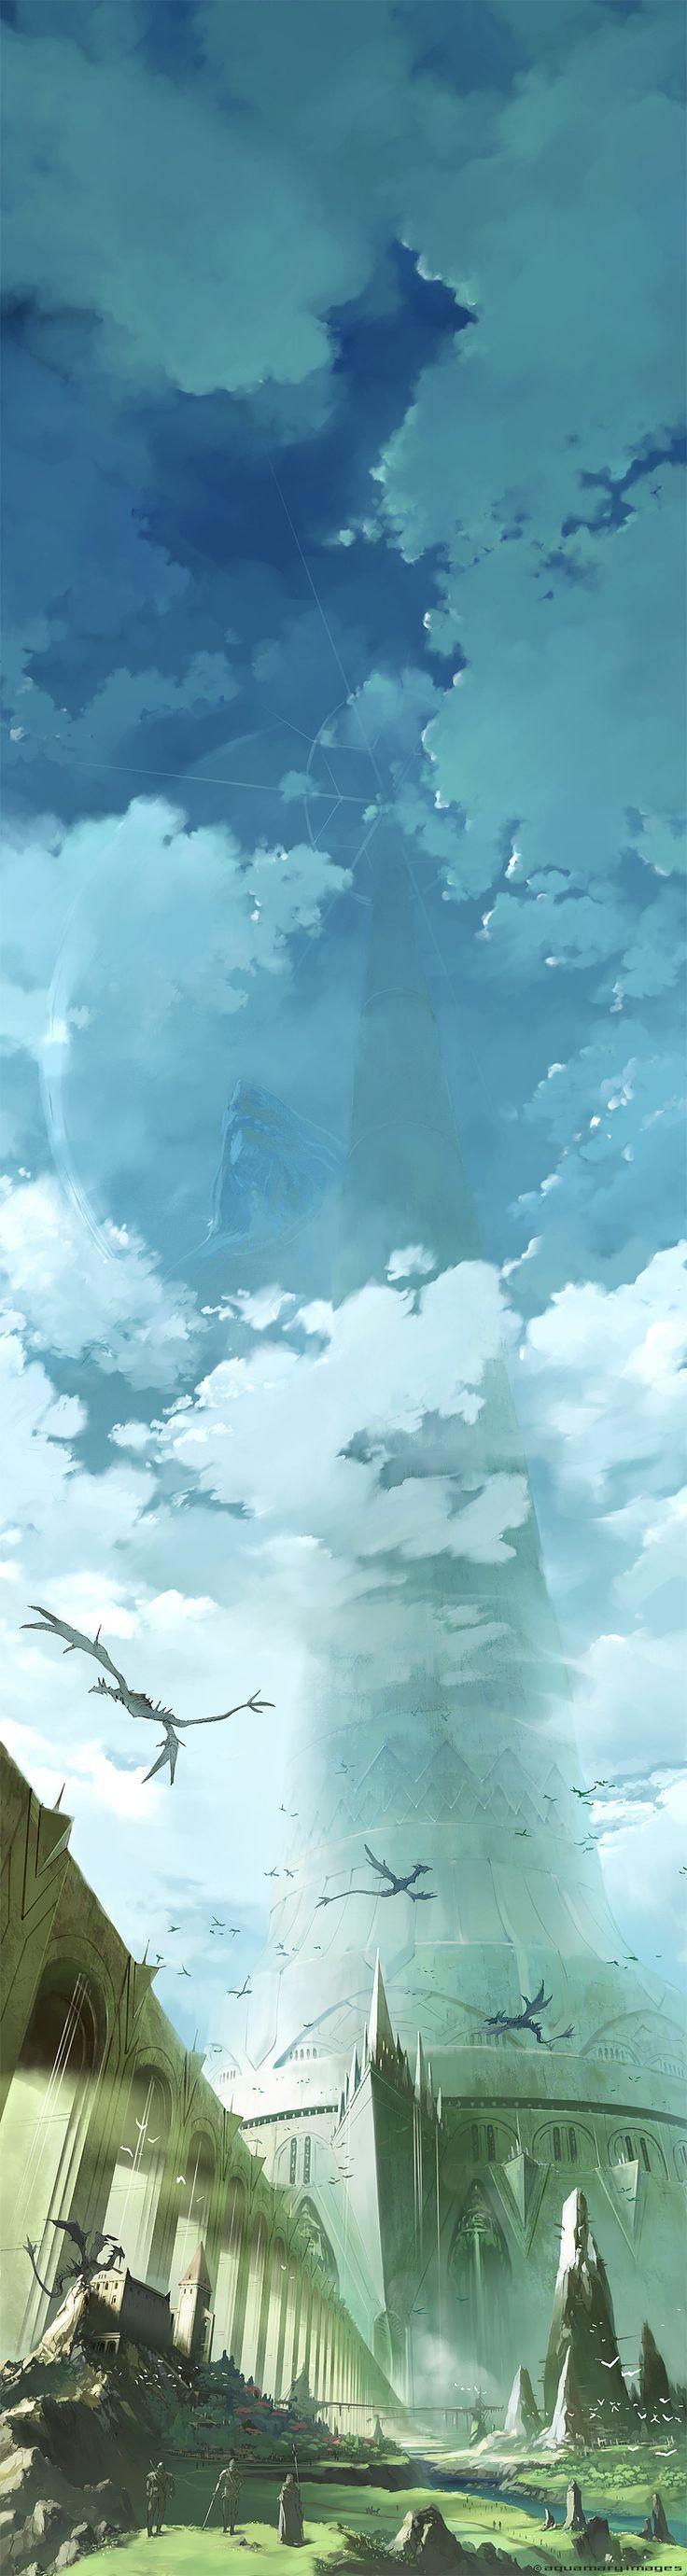 Just a panoramic fantasy photo. - Imgur